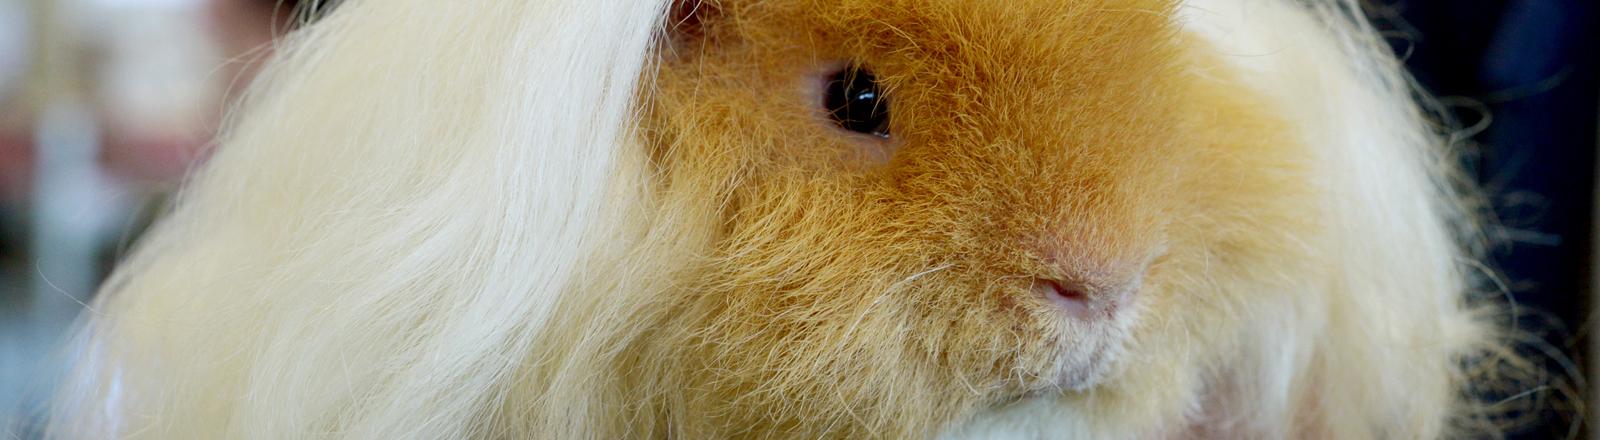 Alpaka Meerschweinchen. dpa